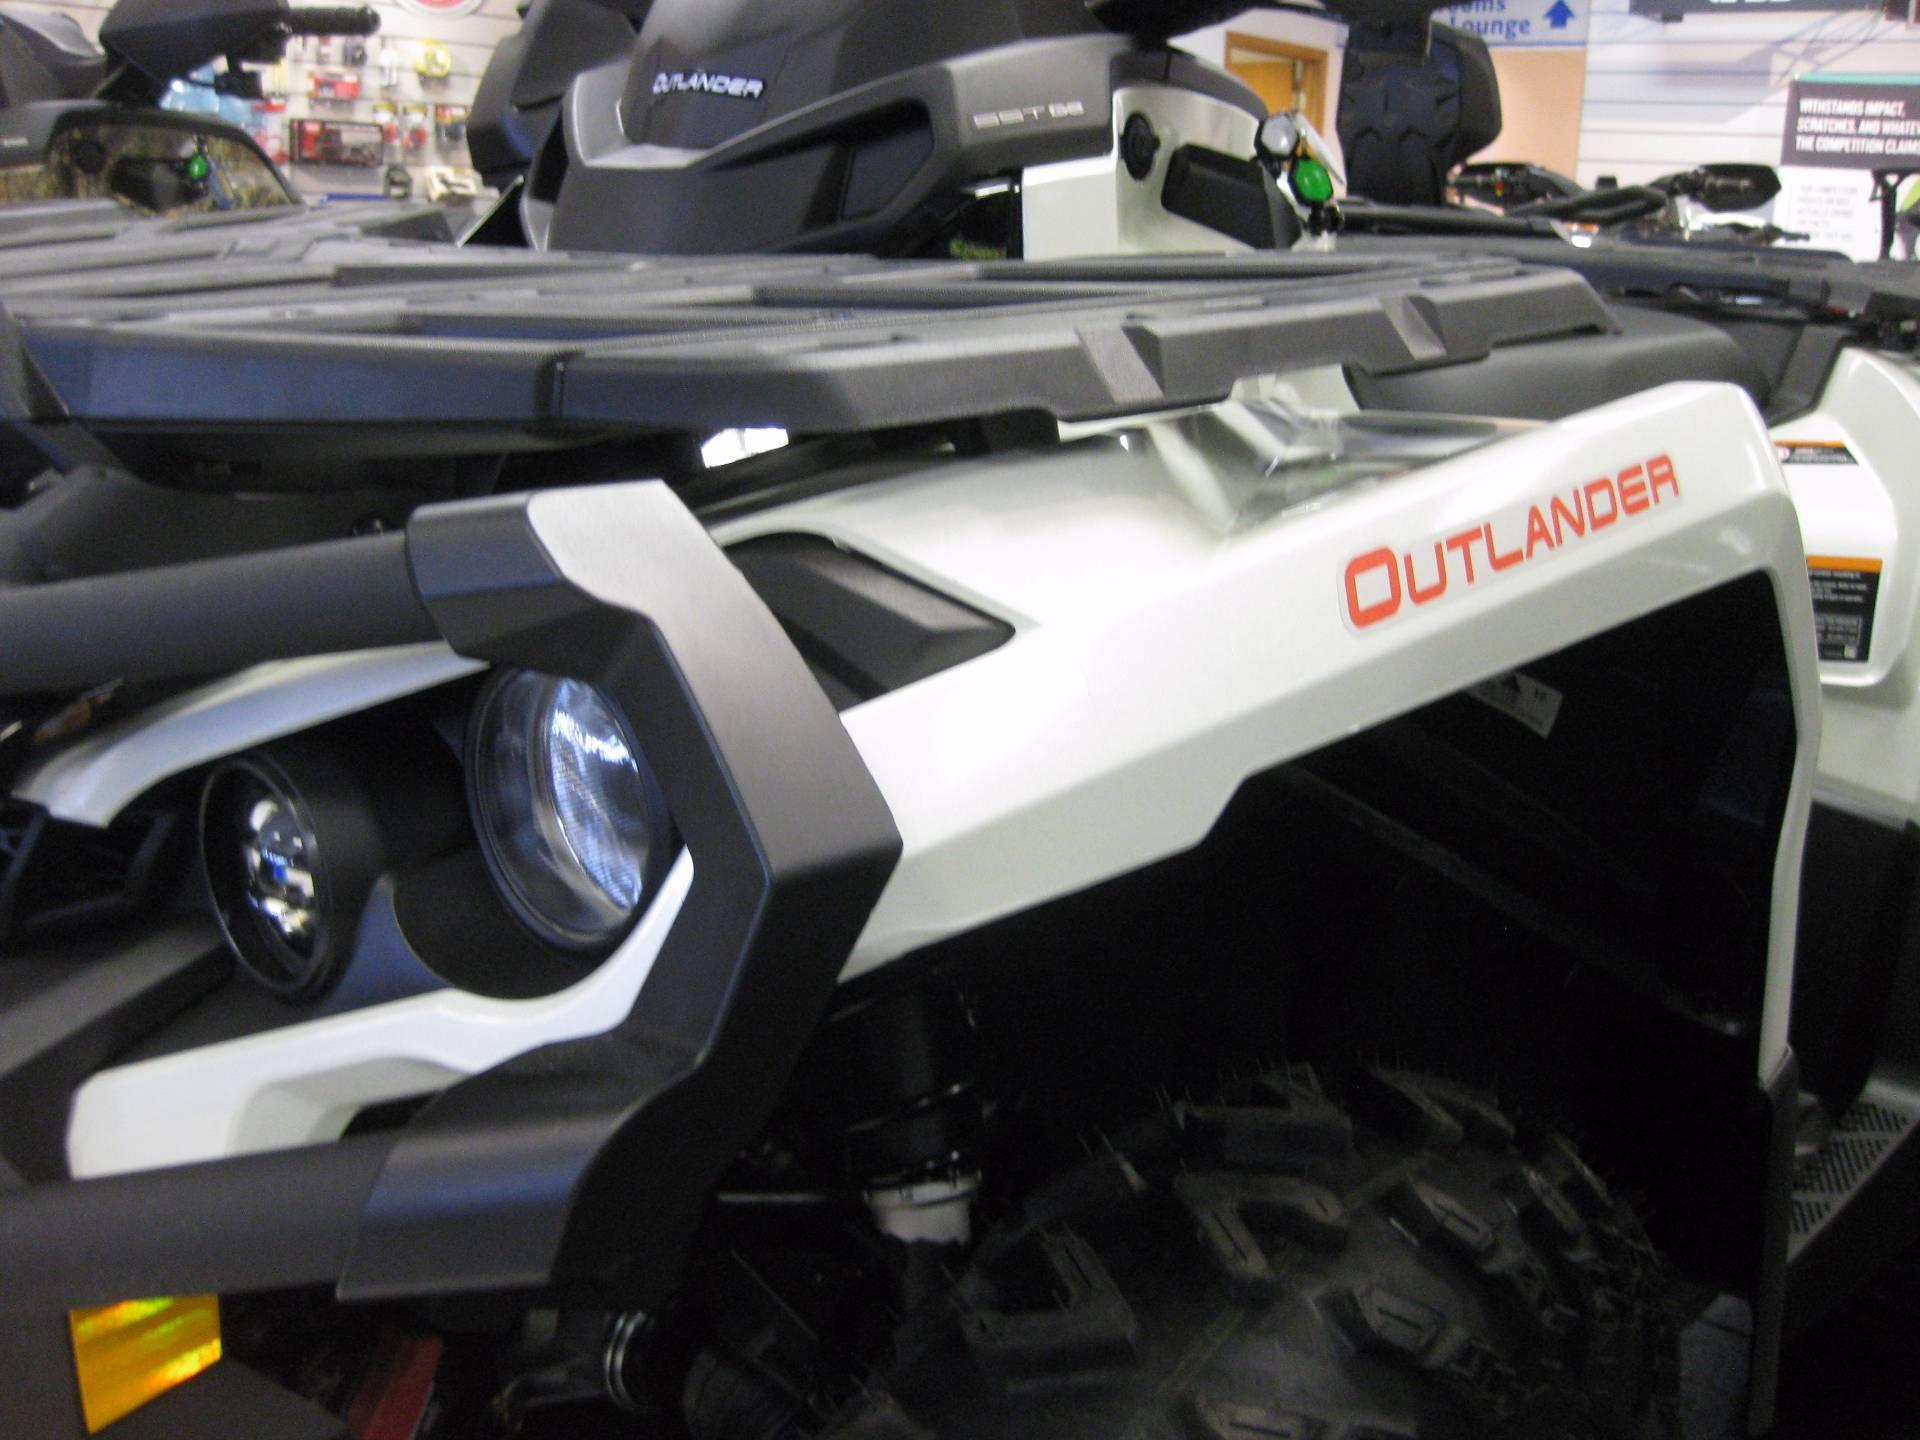 2017 Can-Am Outlander XT 650 in Wisconsin Rapids, Wisconsin